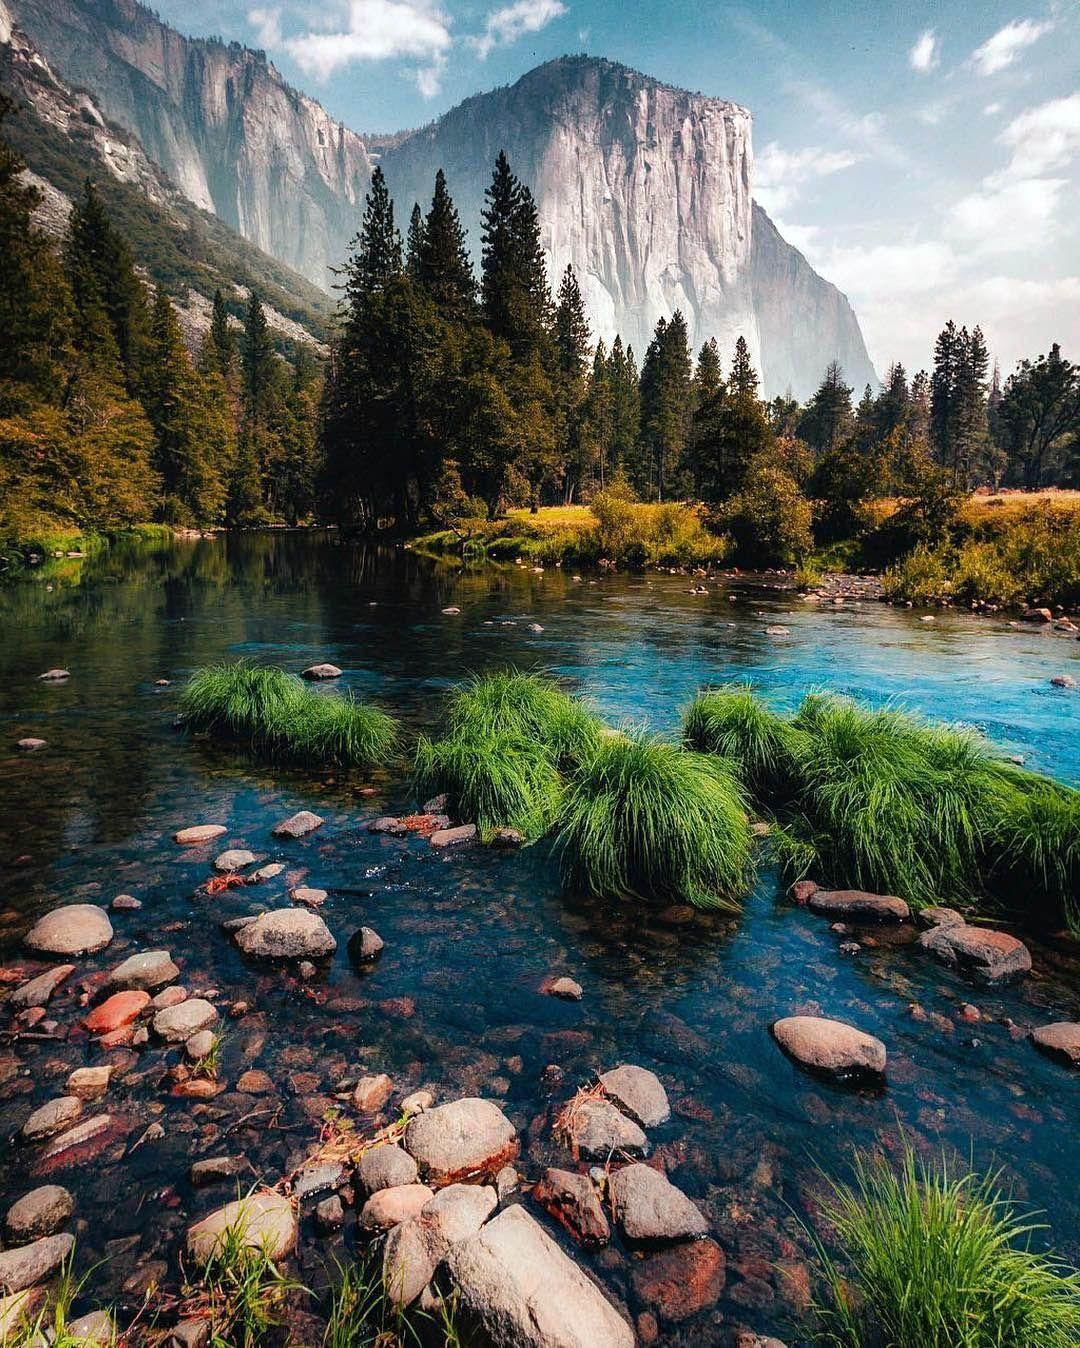 Plan Your Visit Yosemite National Park Logo Exclusive On Travelarize Travel Site National Parks Photography National Parks Beautiful Landscapes